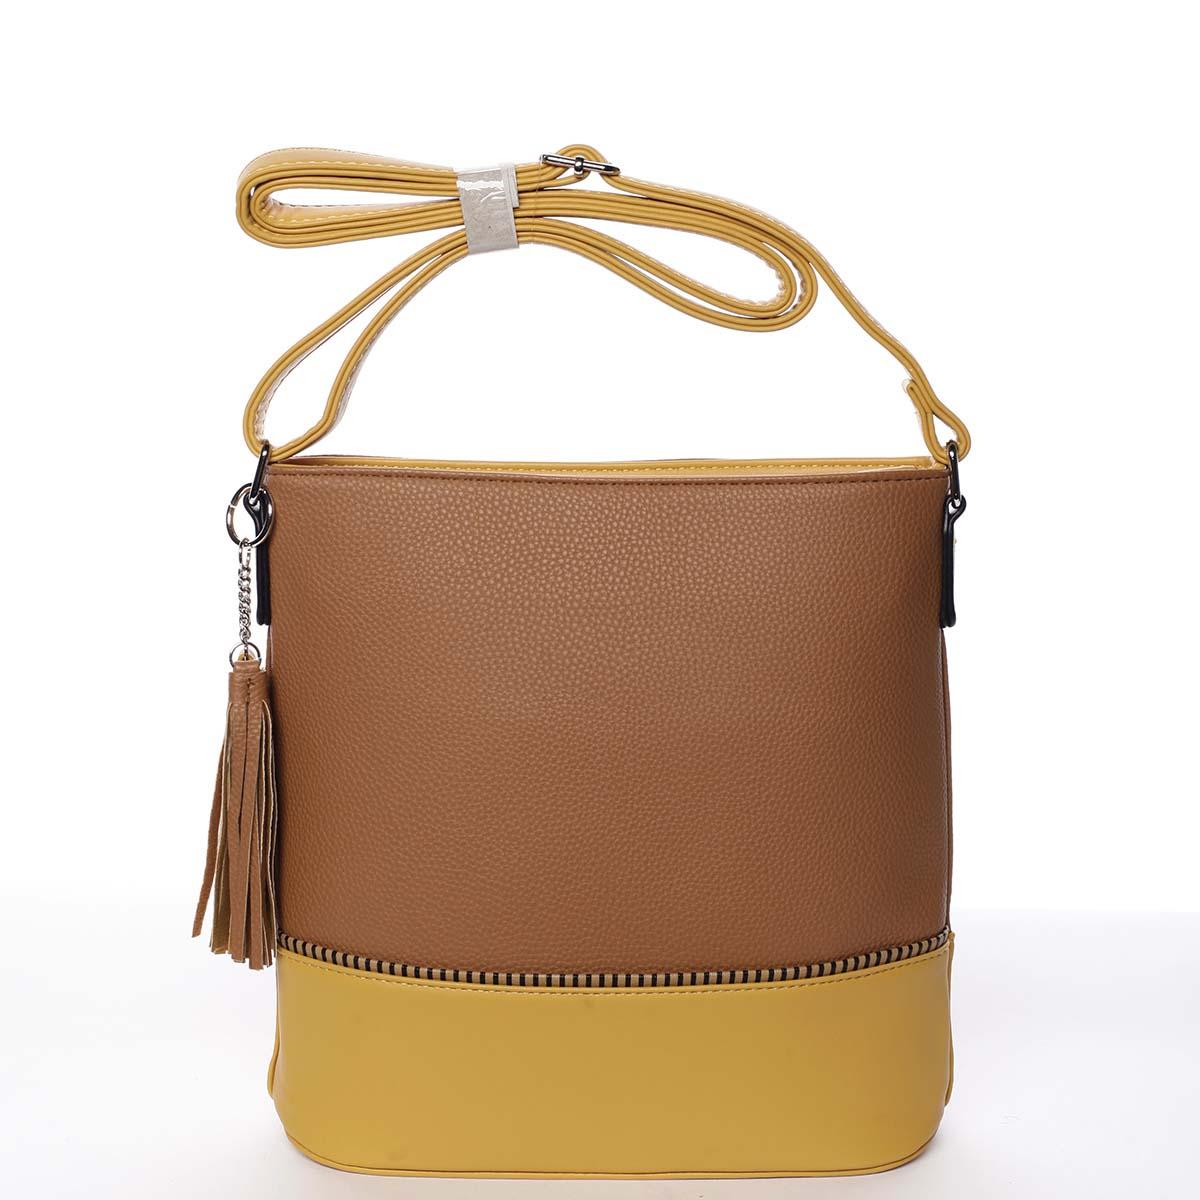 Trendy dámska crossbody kabelka hnedá - Dudlin Adriana